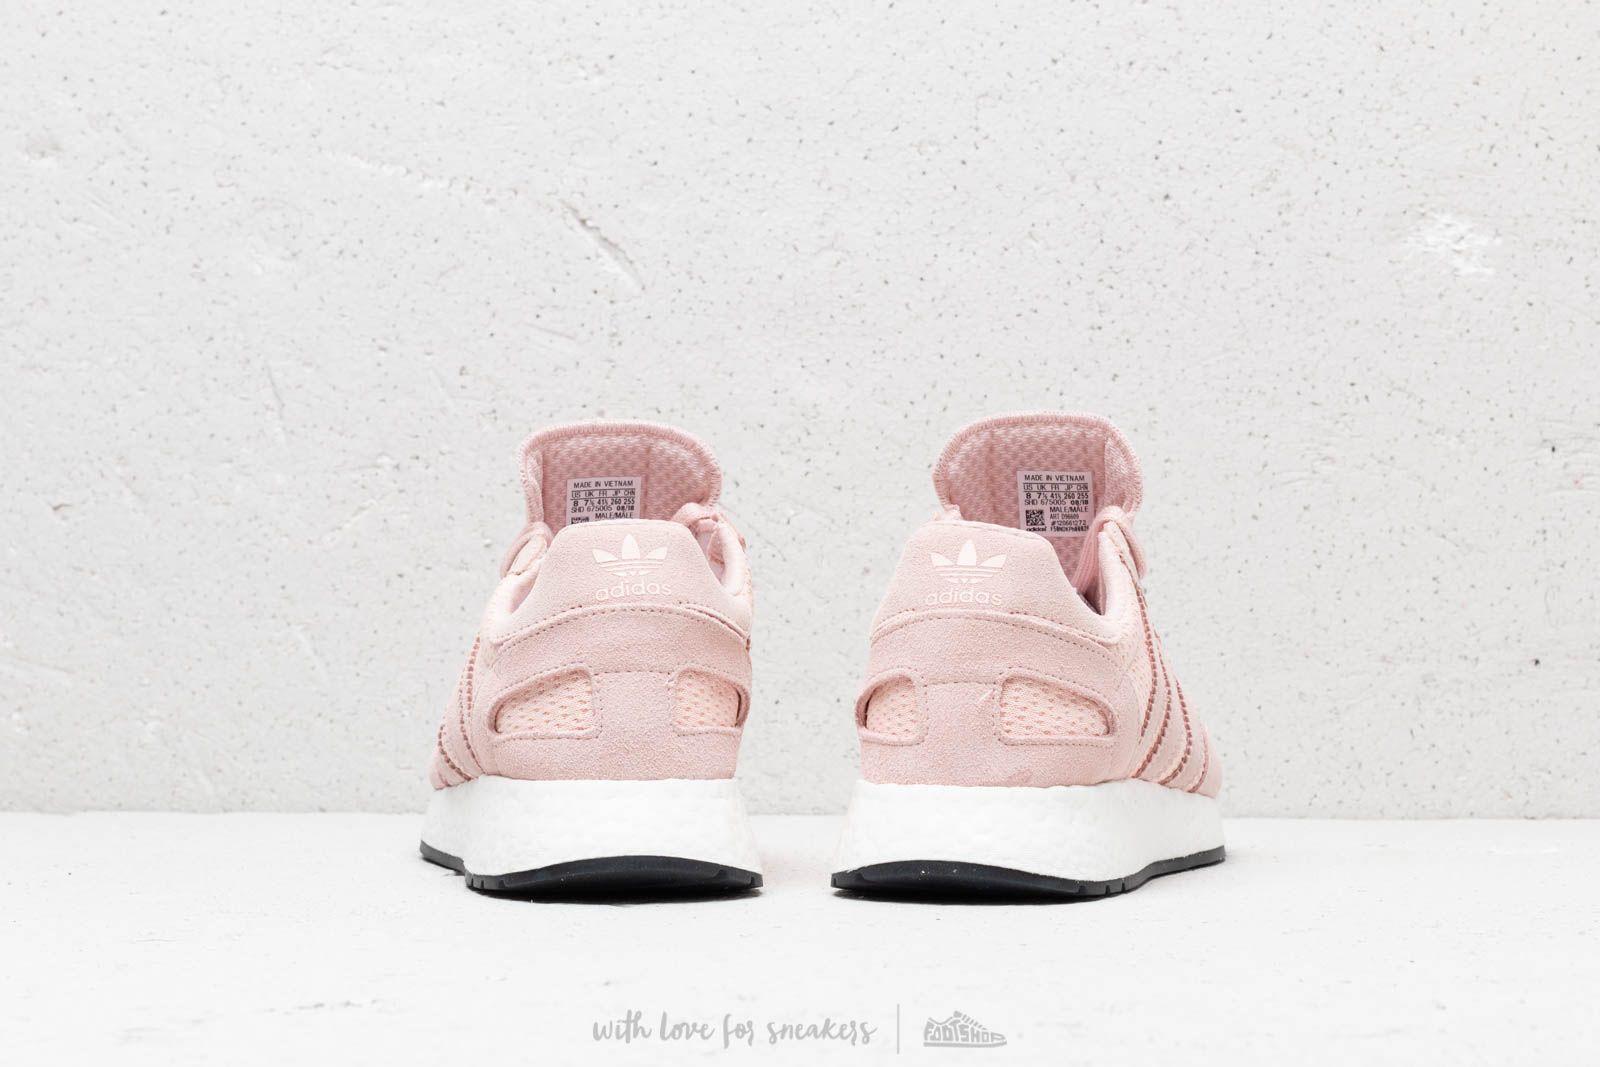 zapatilla liberal Maniobra  Men's shoes adidas I-5923 Icey Pink/ Icey Pink/ Core Black | Footshop